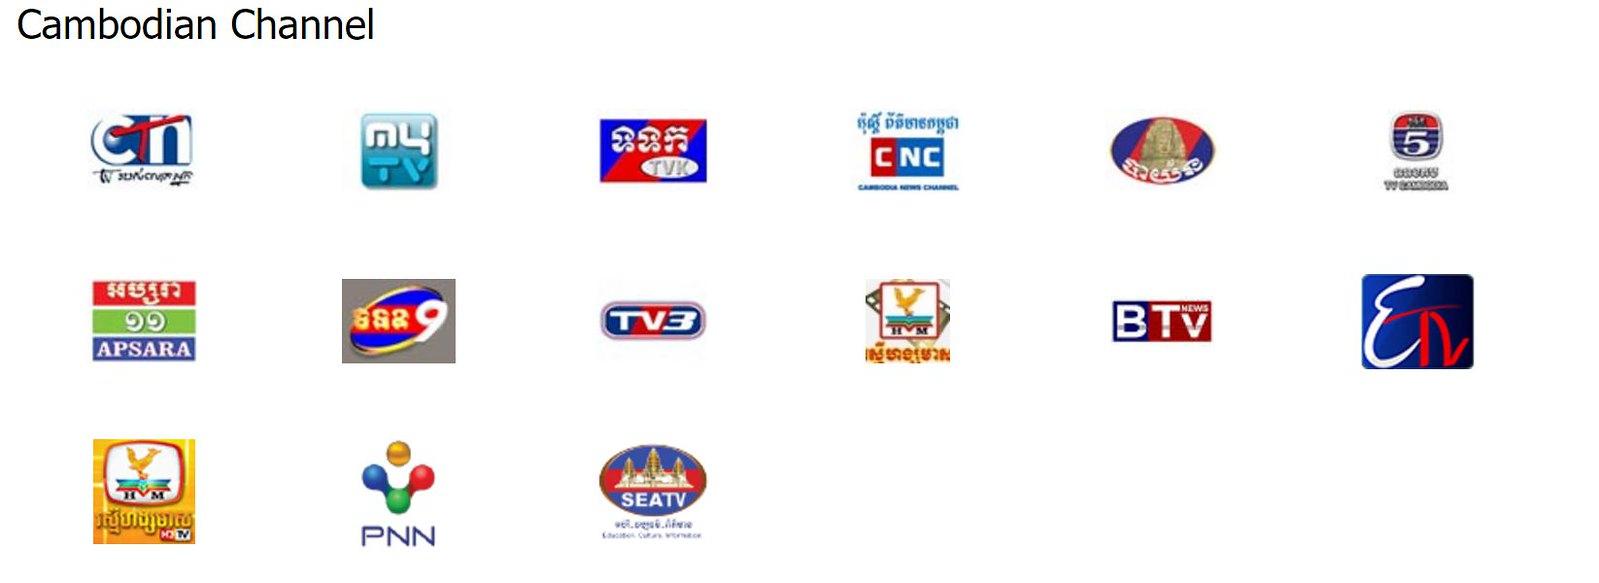 Danh sách kênh DTV Cambodia